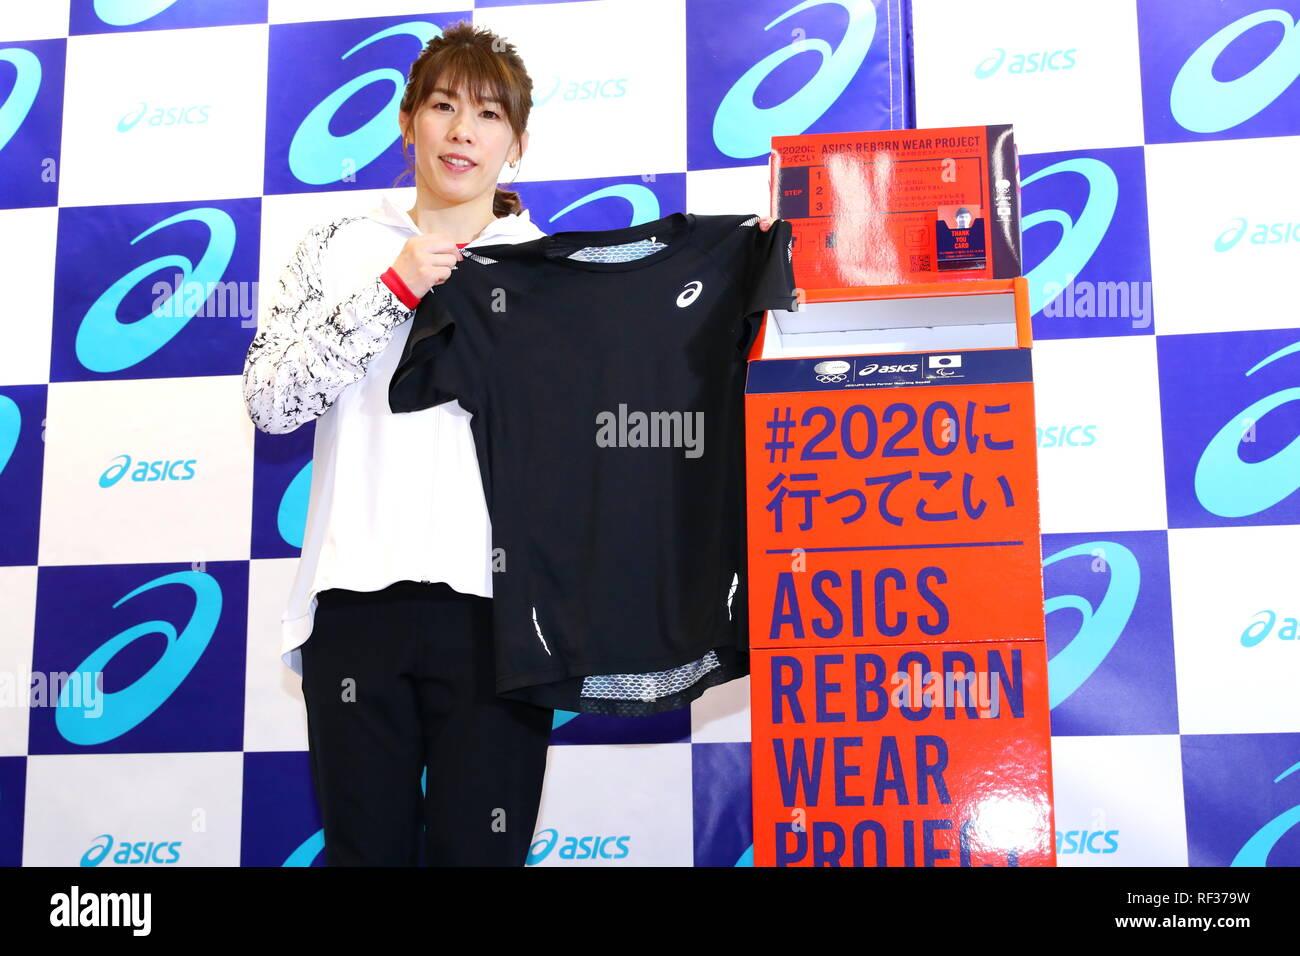 calidad primero diversos estilos elegir despacho Saori Yoshida, JANUARY 24, 2019: ASICS Corporation attends a press  conference to announce ASICS REBRON WEAR